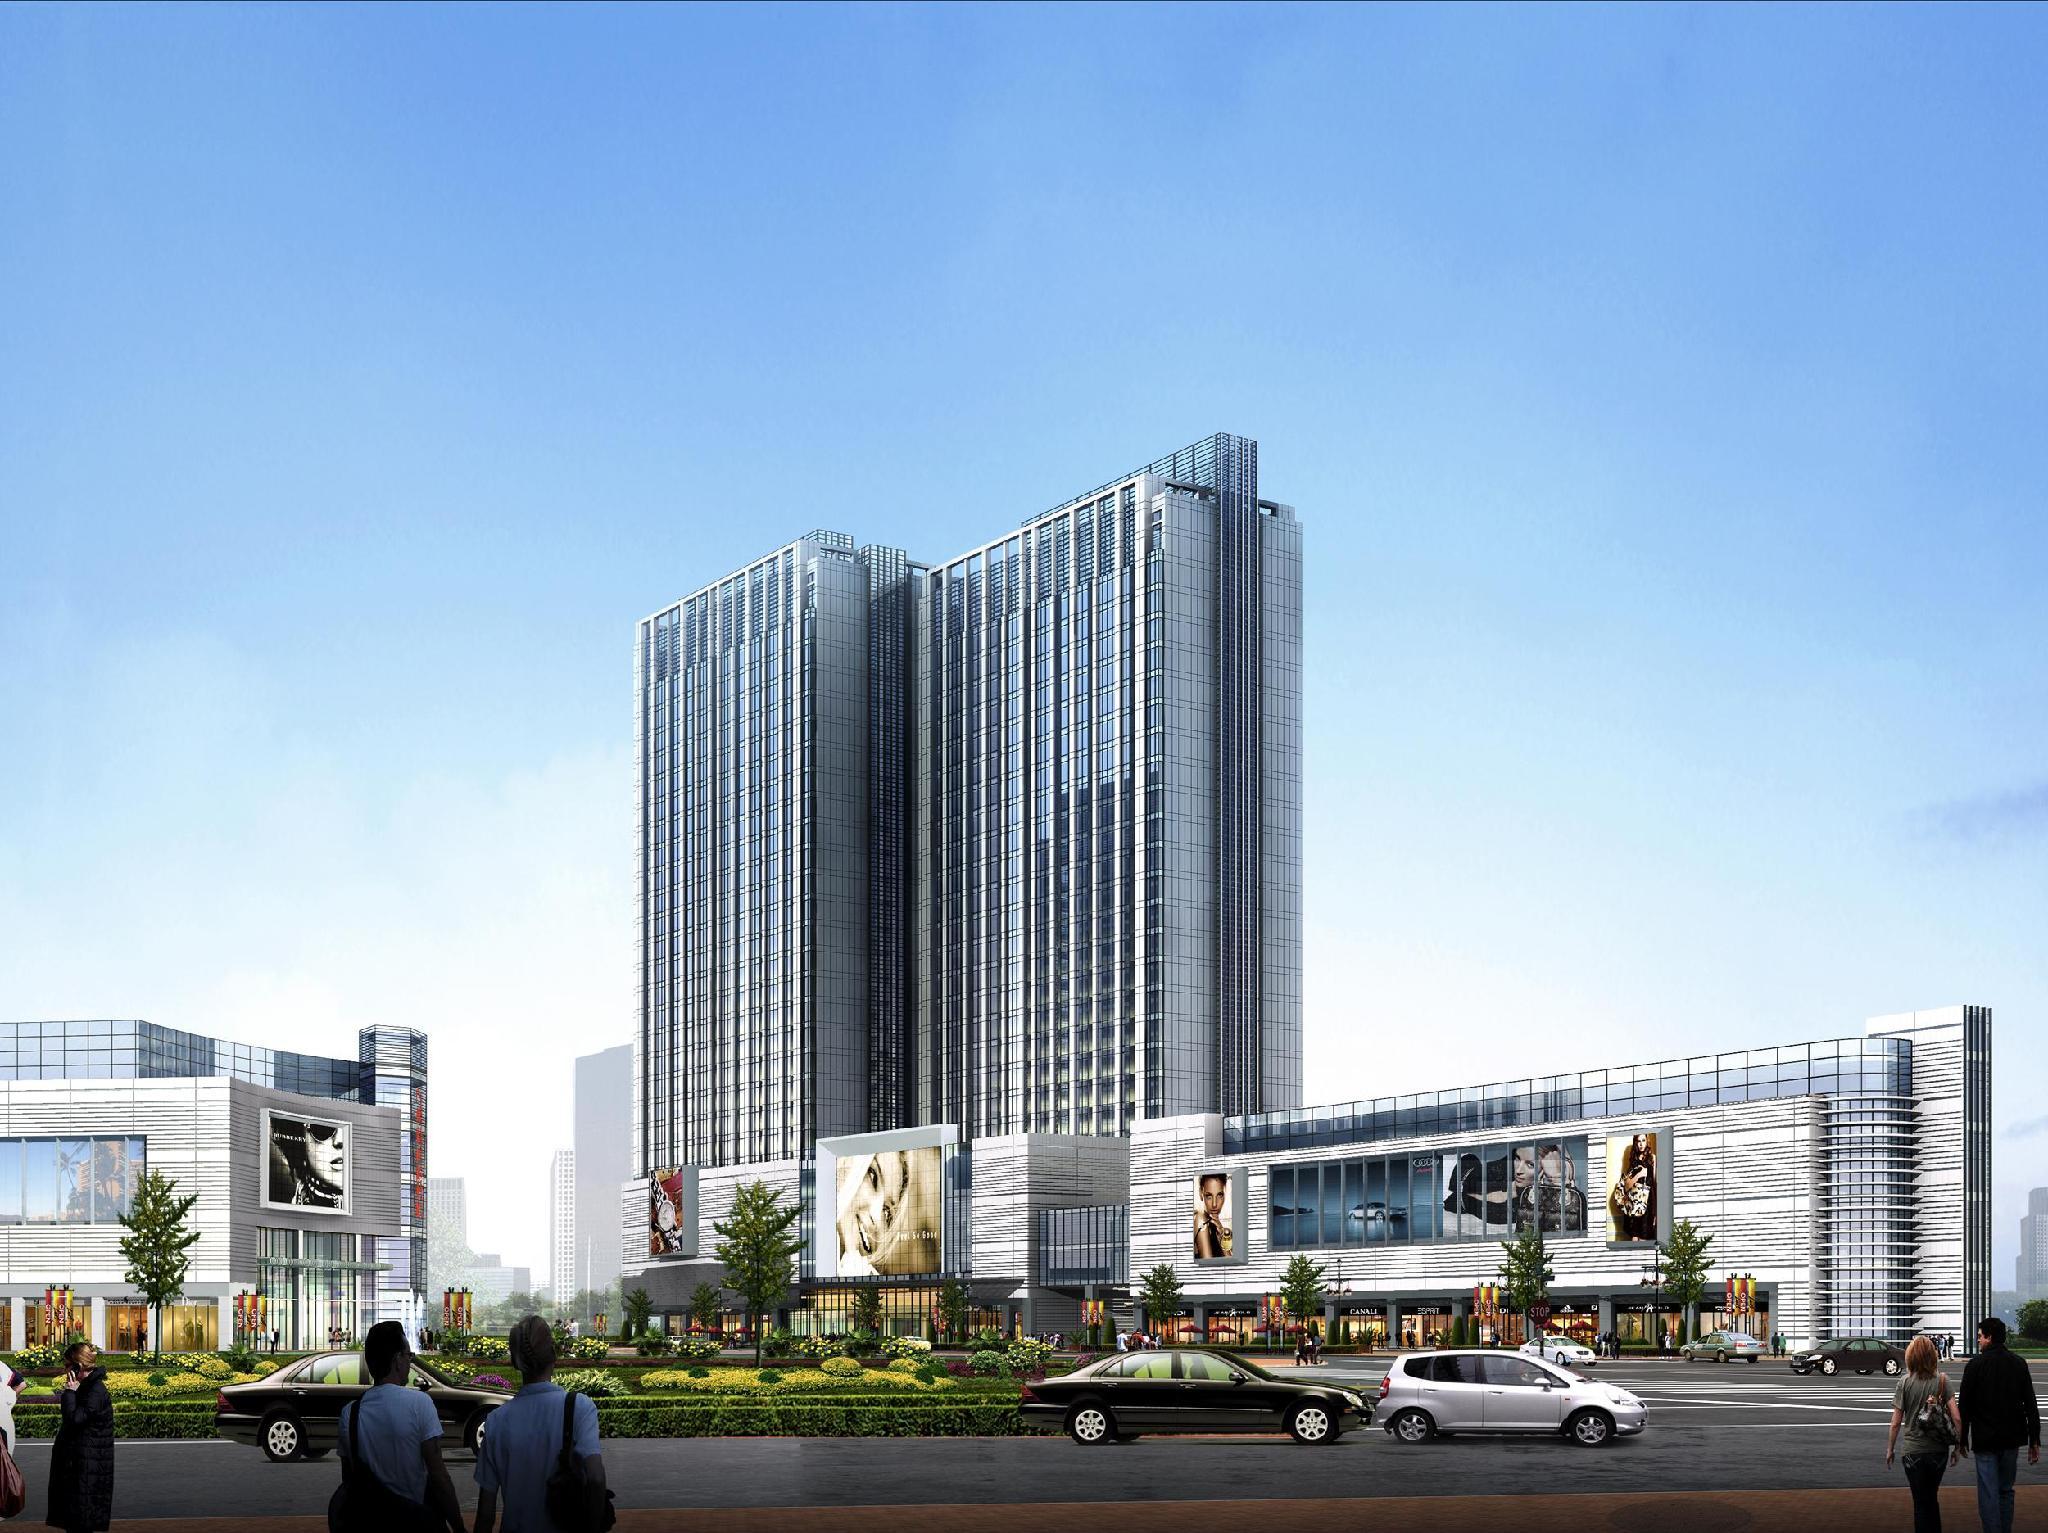 Baihe International Apartment Hotel Kecun Hopson Square